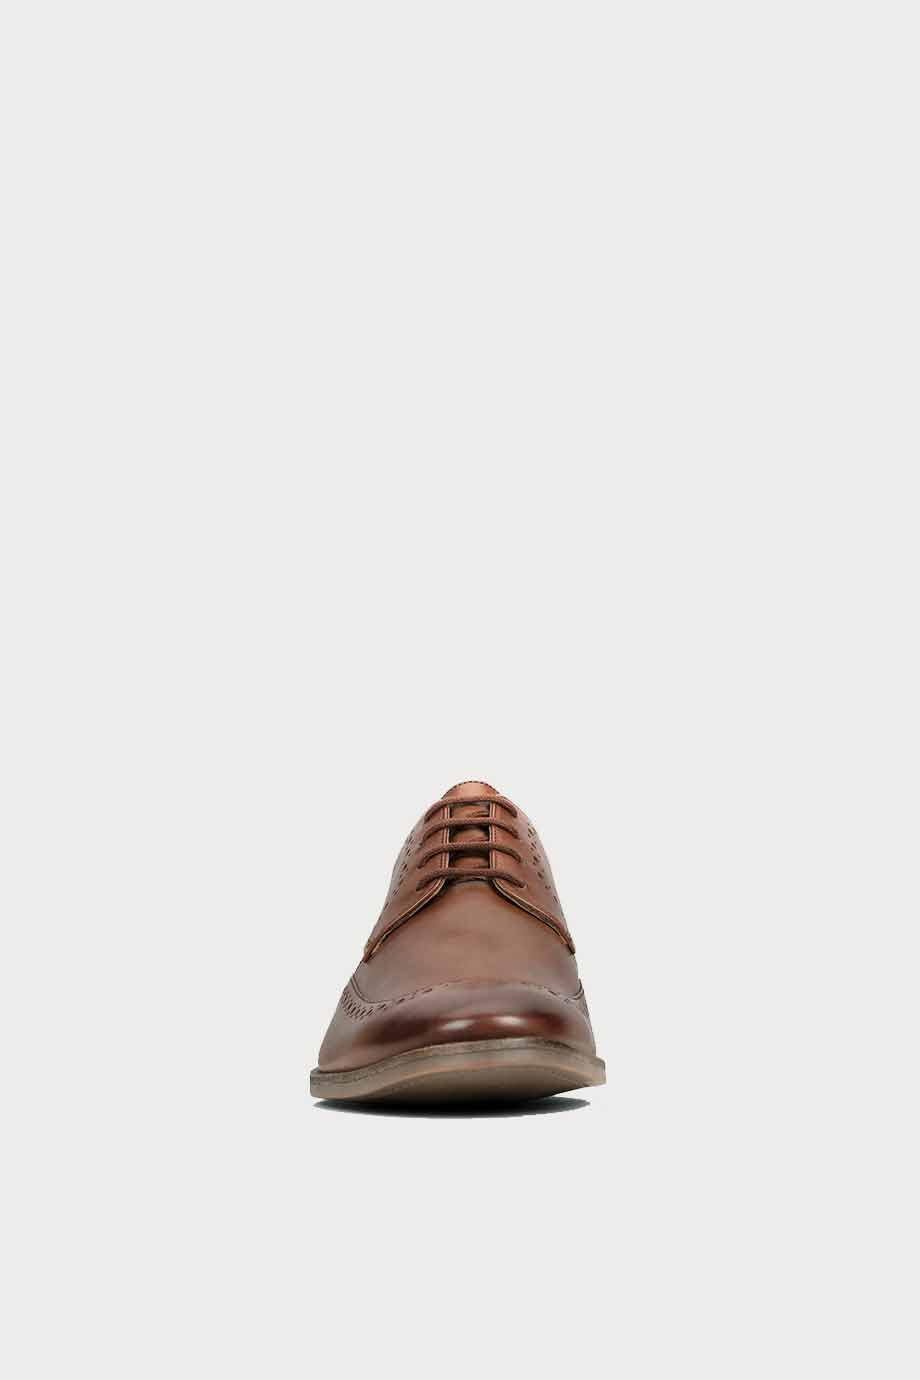 spiridoula metheniti shoes xalkida p Stanford Limit clarks tan leather 2